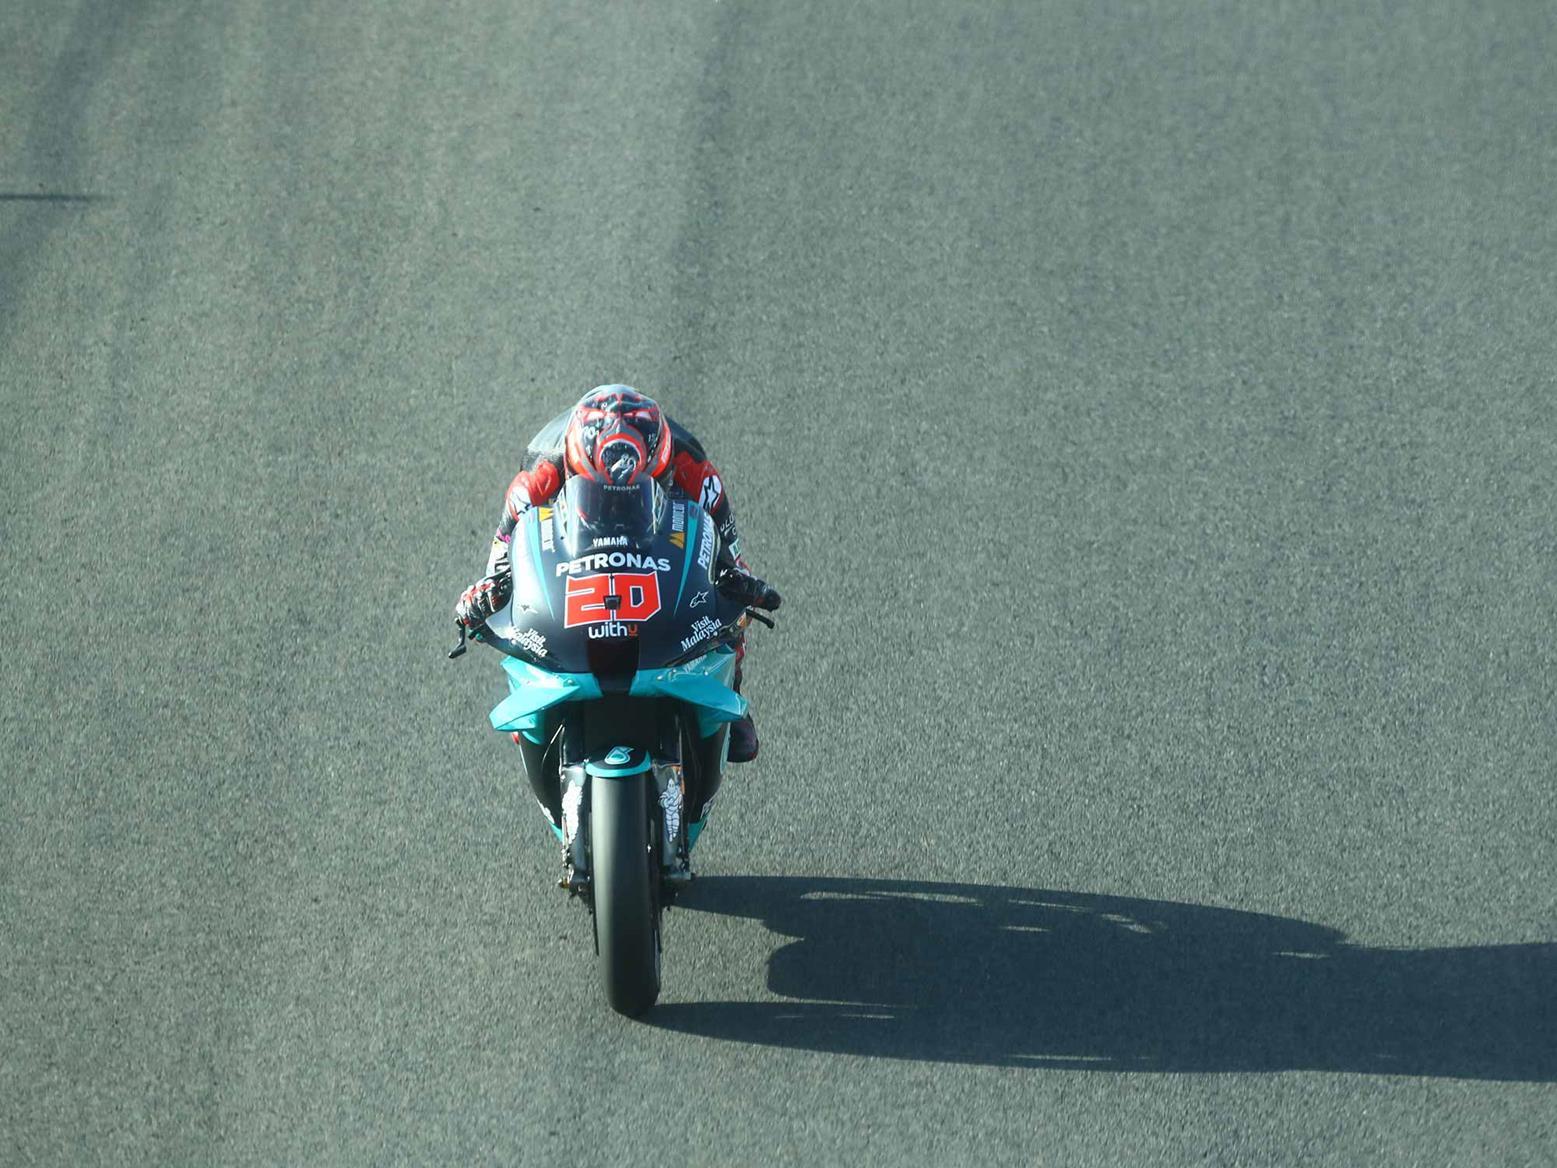 Motogp Fabio Quartararo Storms To Victory At Jerez As Yamaha Lockout The Podium Mcn